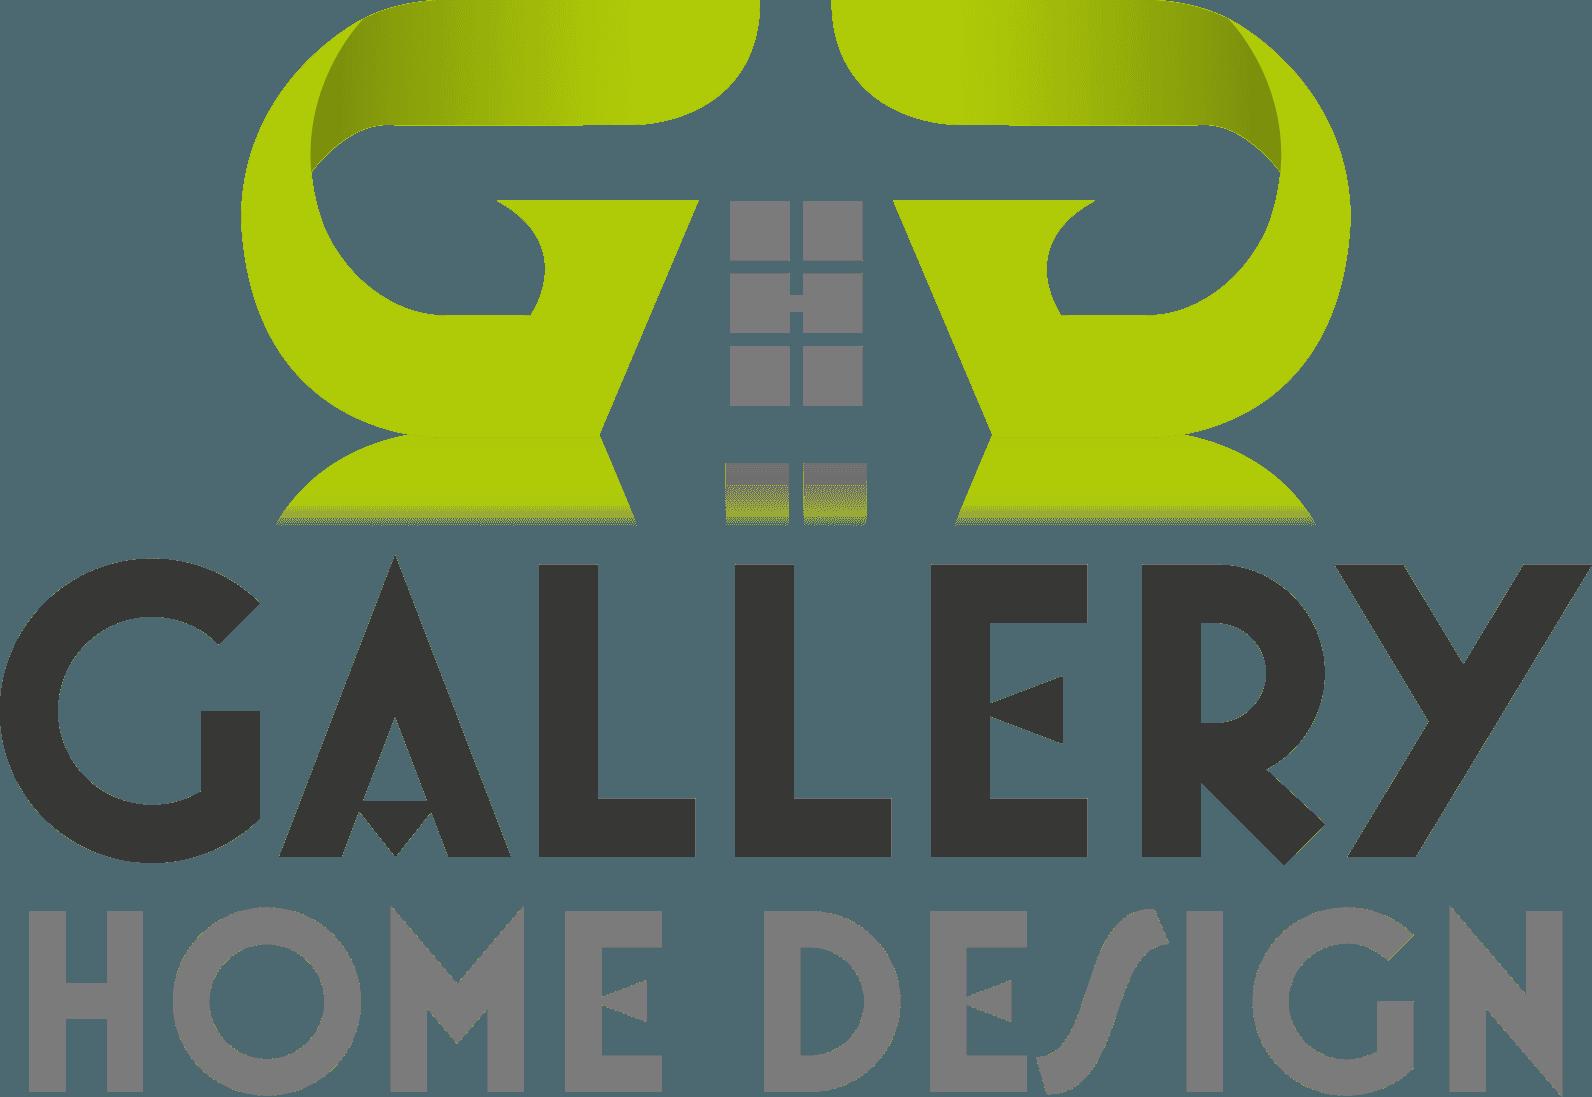 gallery home design logo